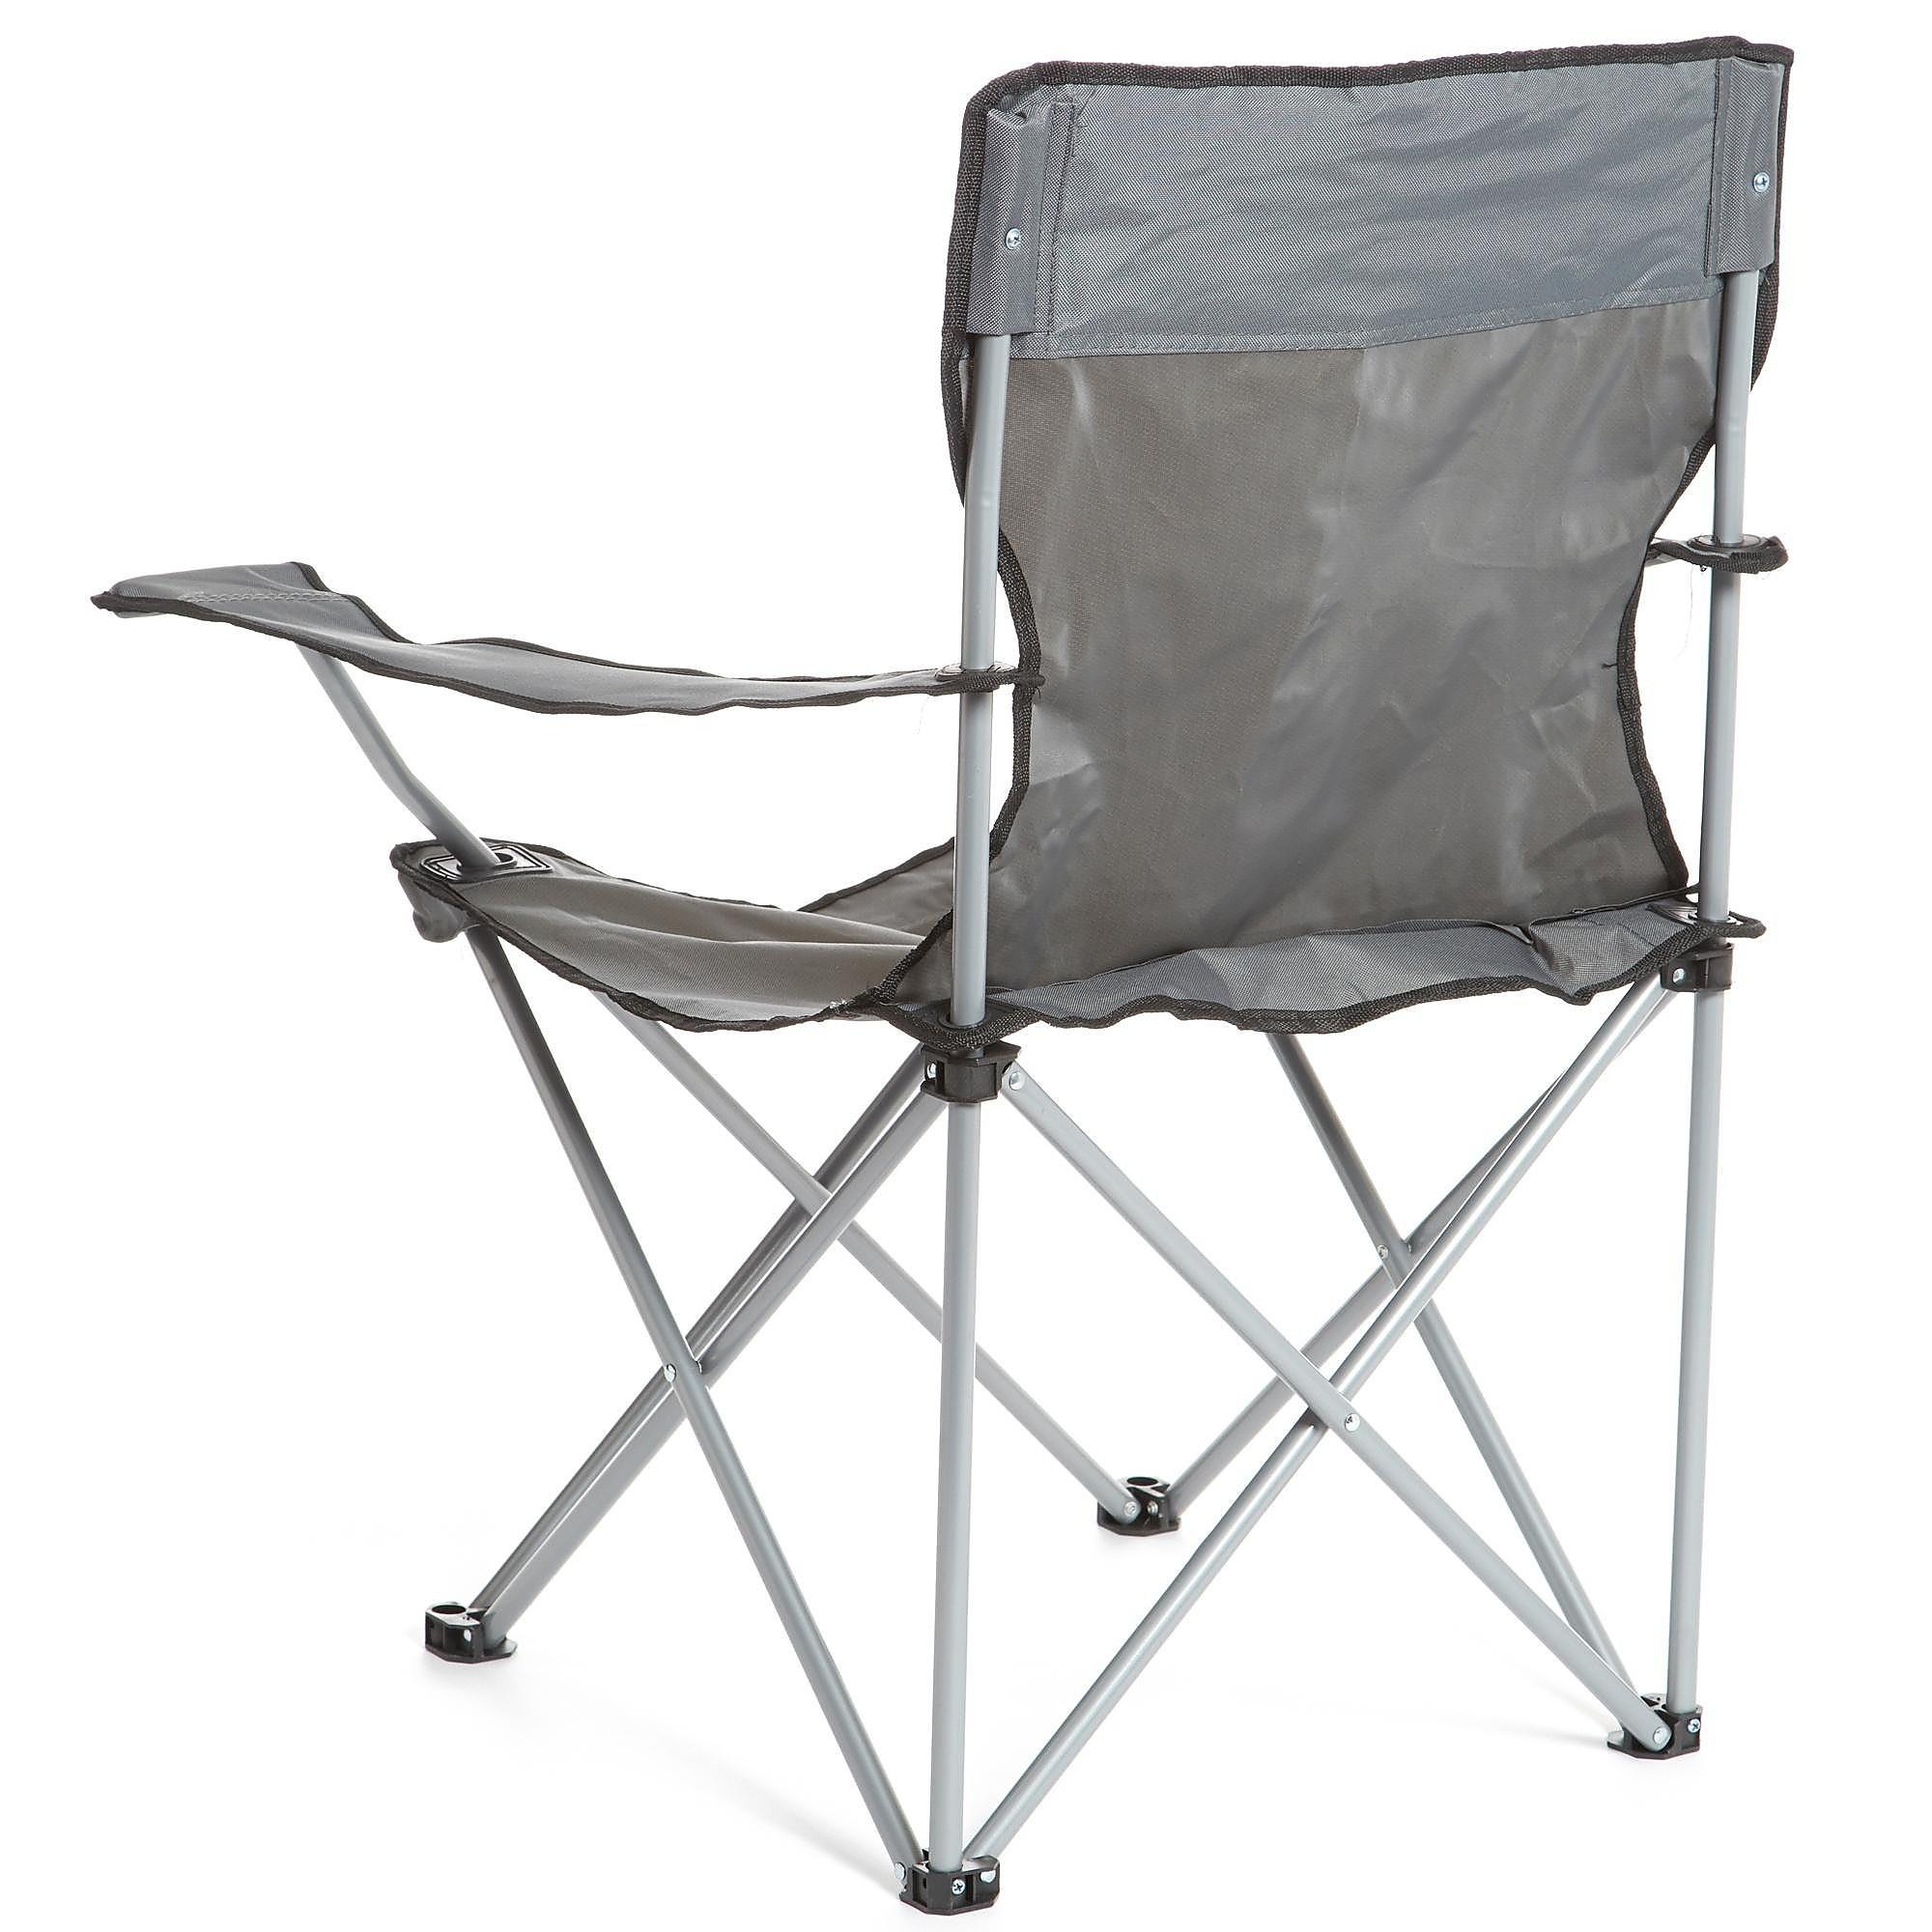 EUROHIKE Peak Folding Chair